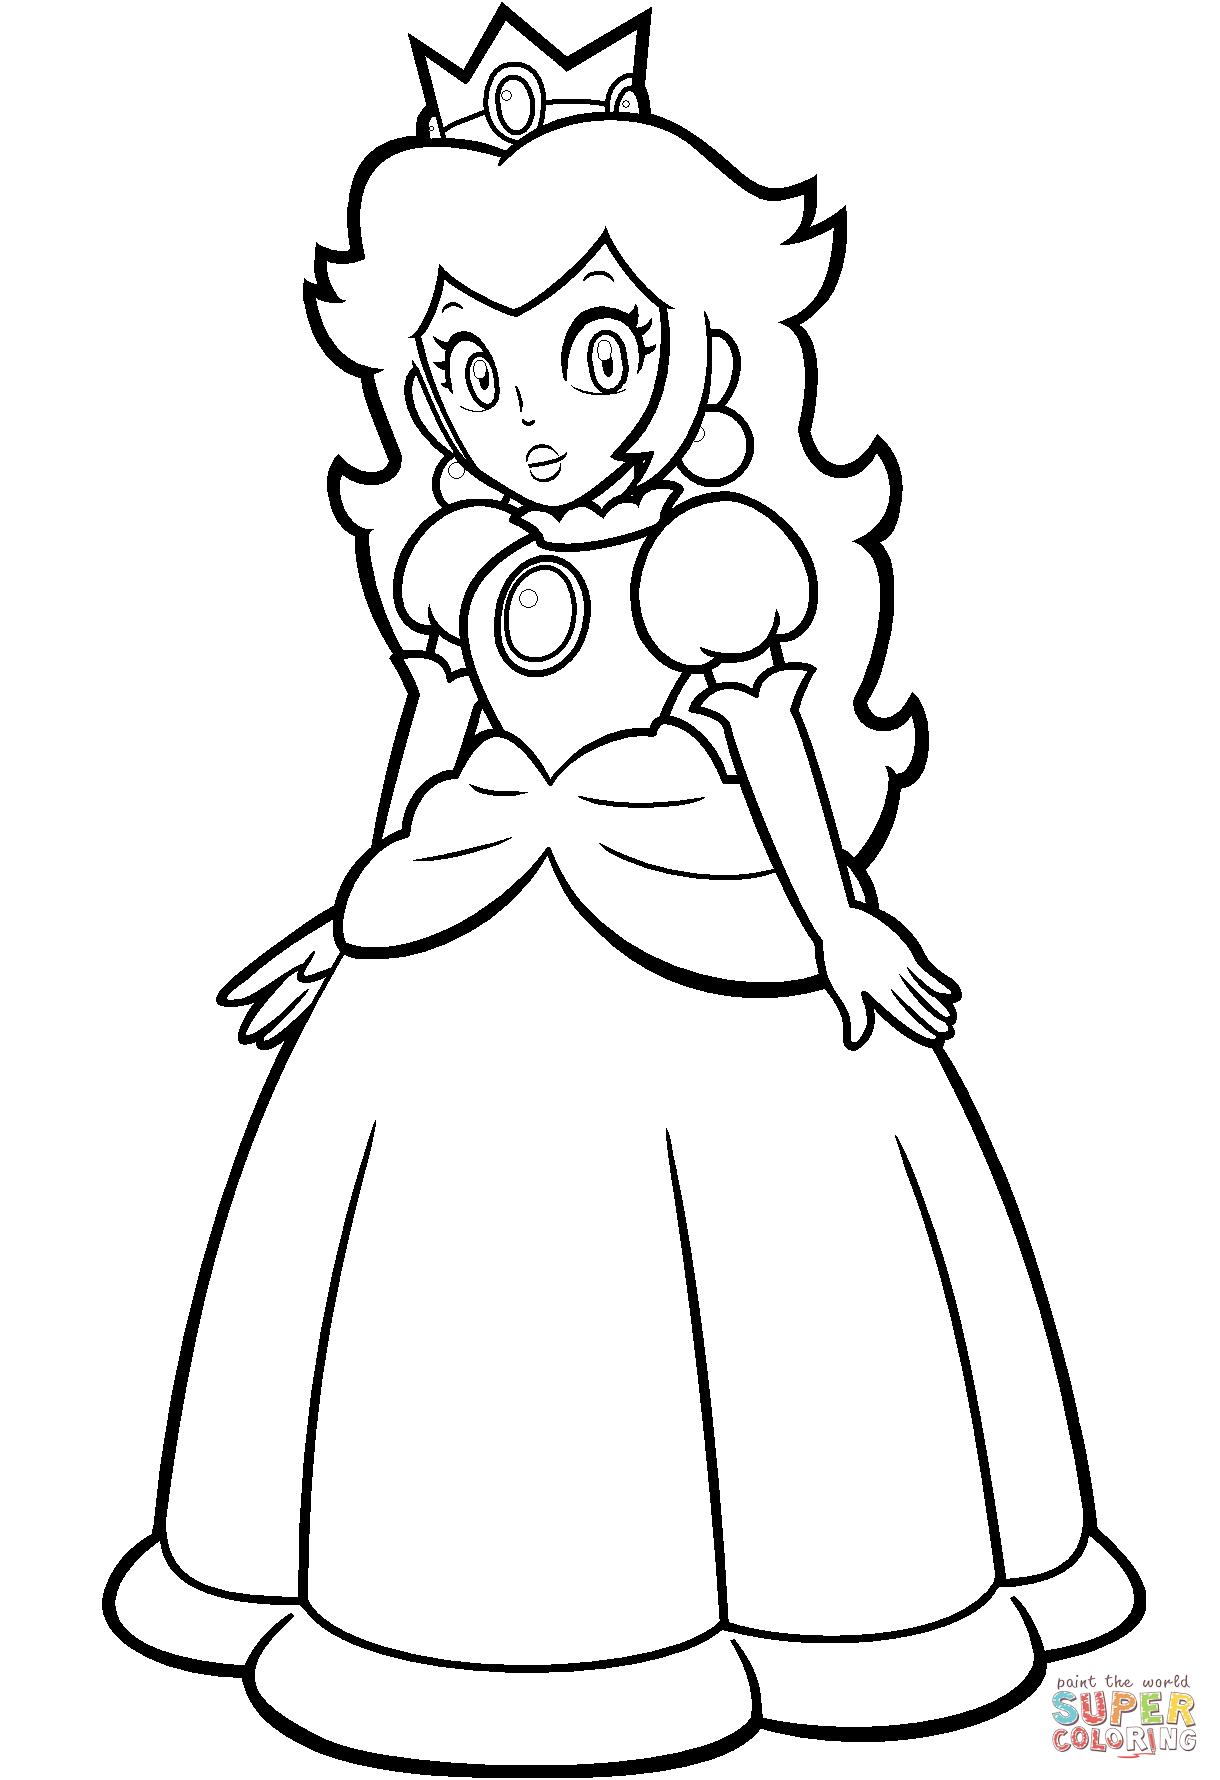 Peach From Mario Coloring Pages Mario Princess Peach Coloring Page Free Printable Coloring Pages